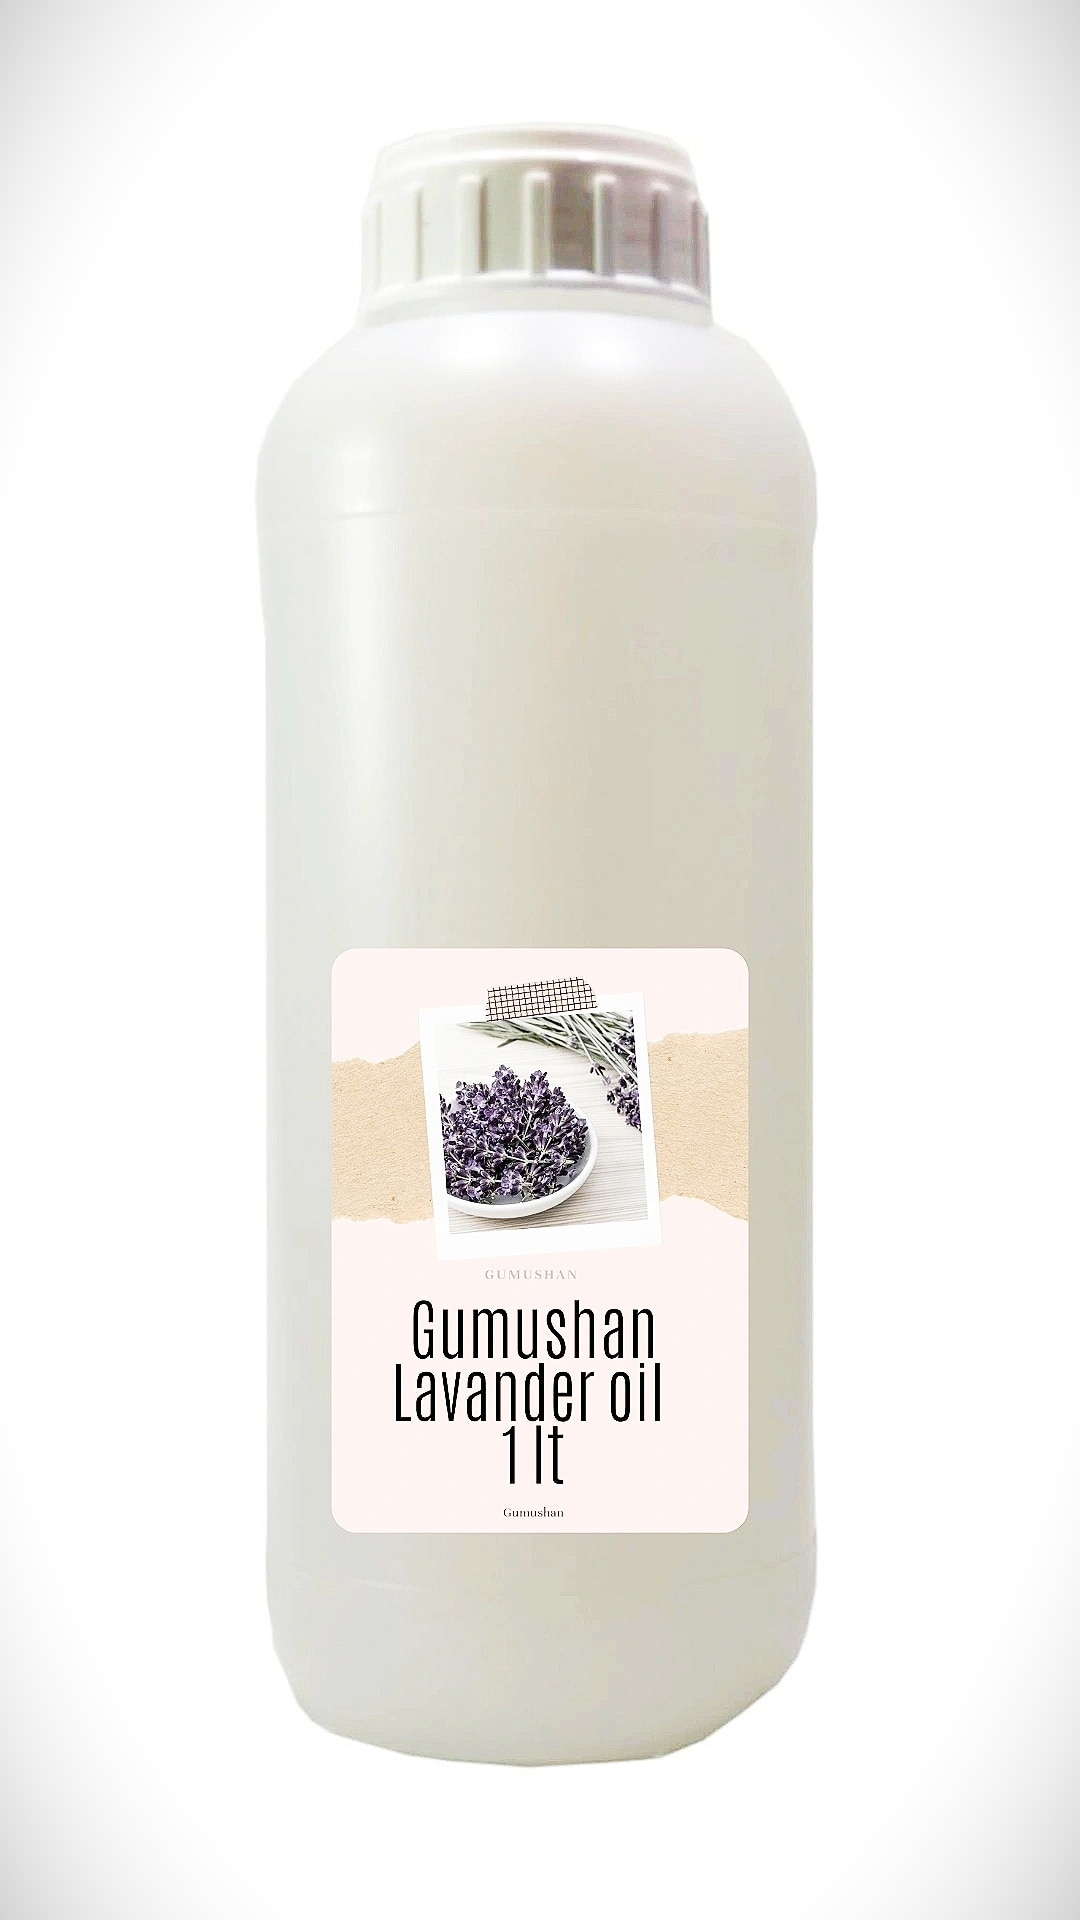 High quality pure Lavander Oil 1 liter 34 fl oz 1000ml